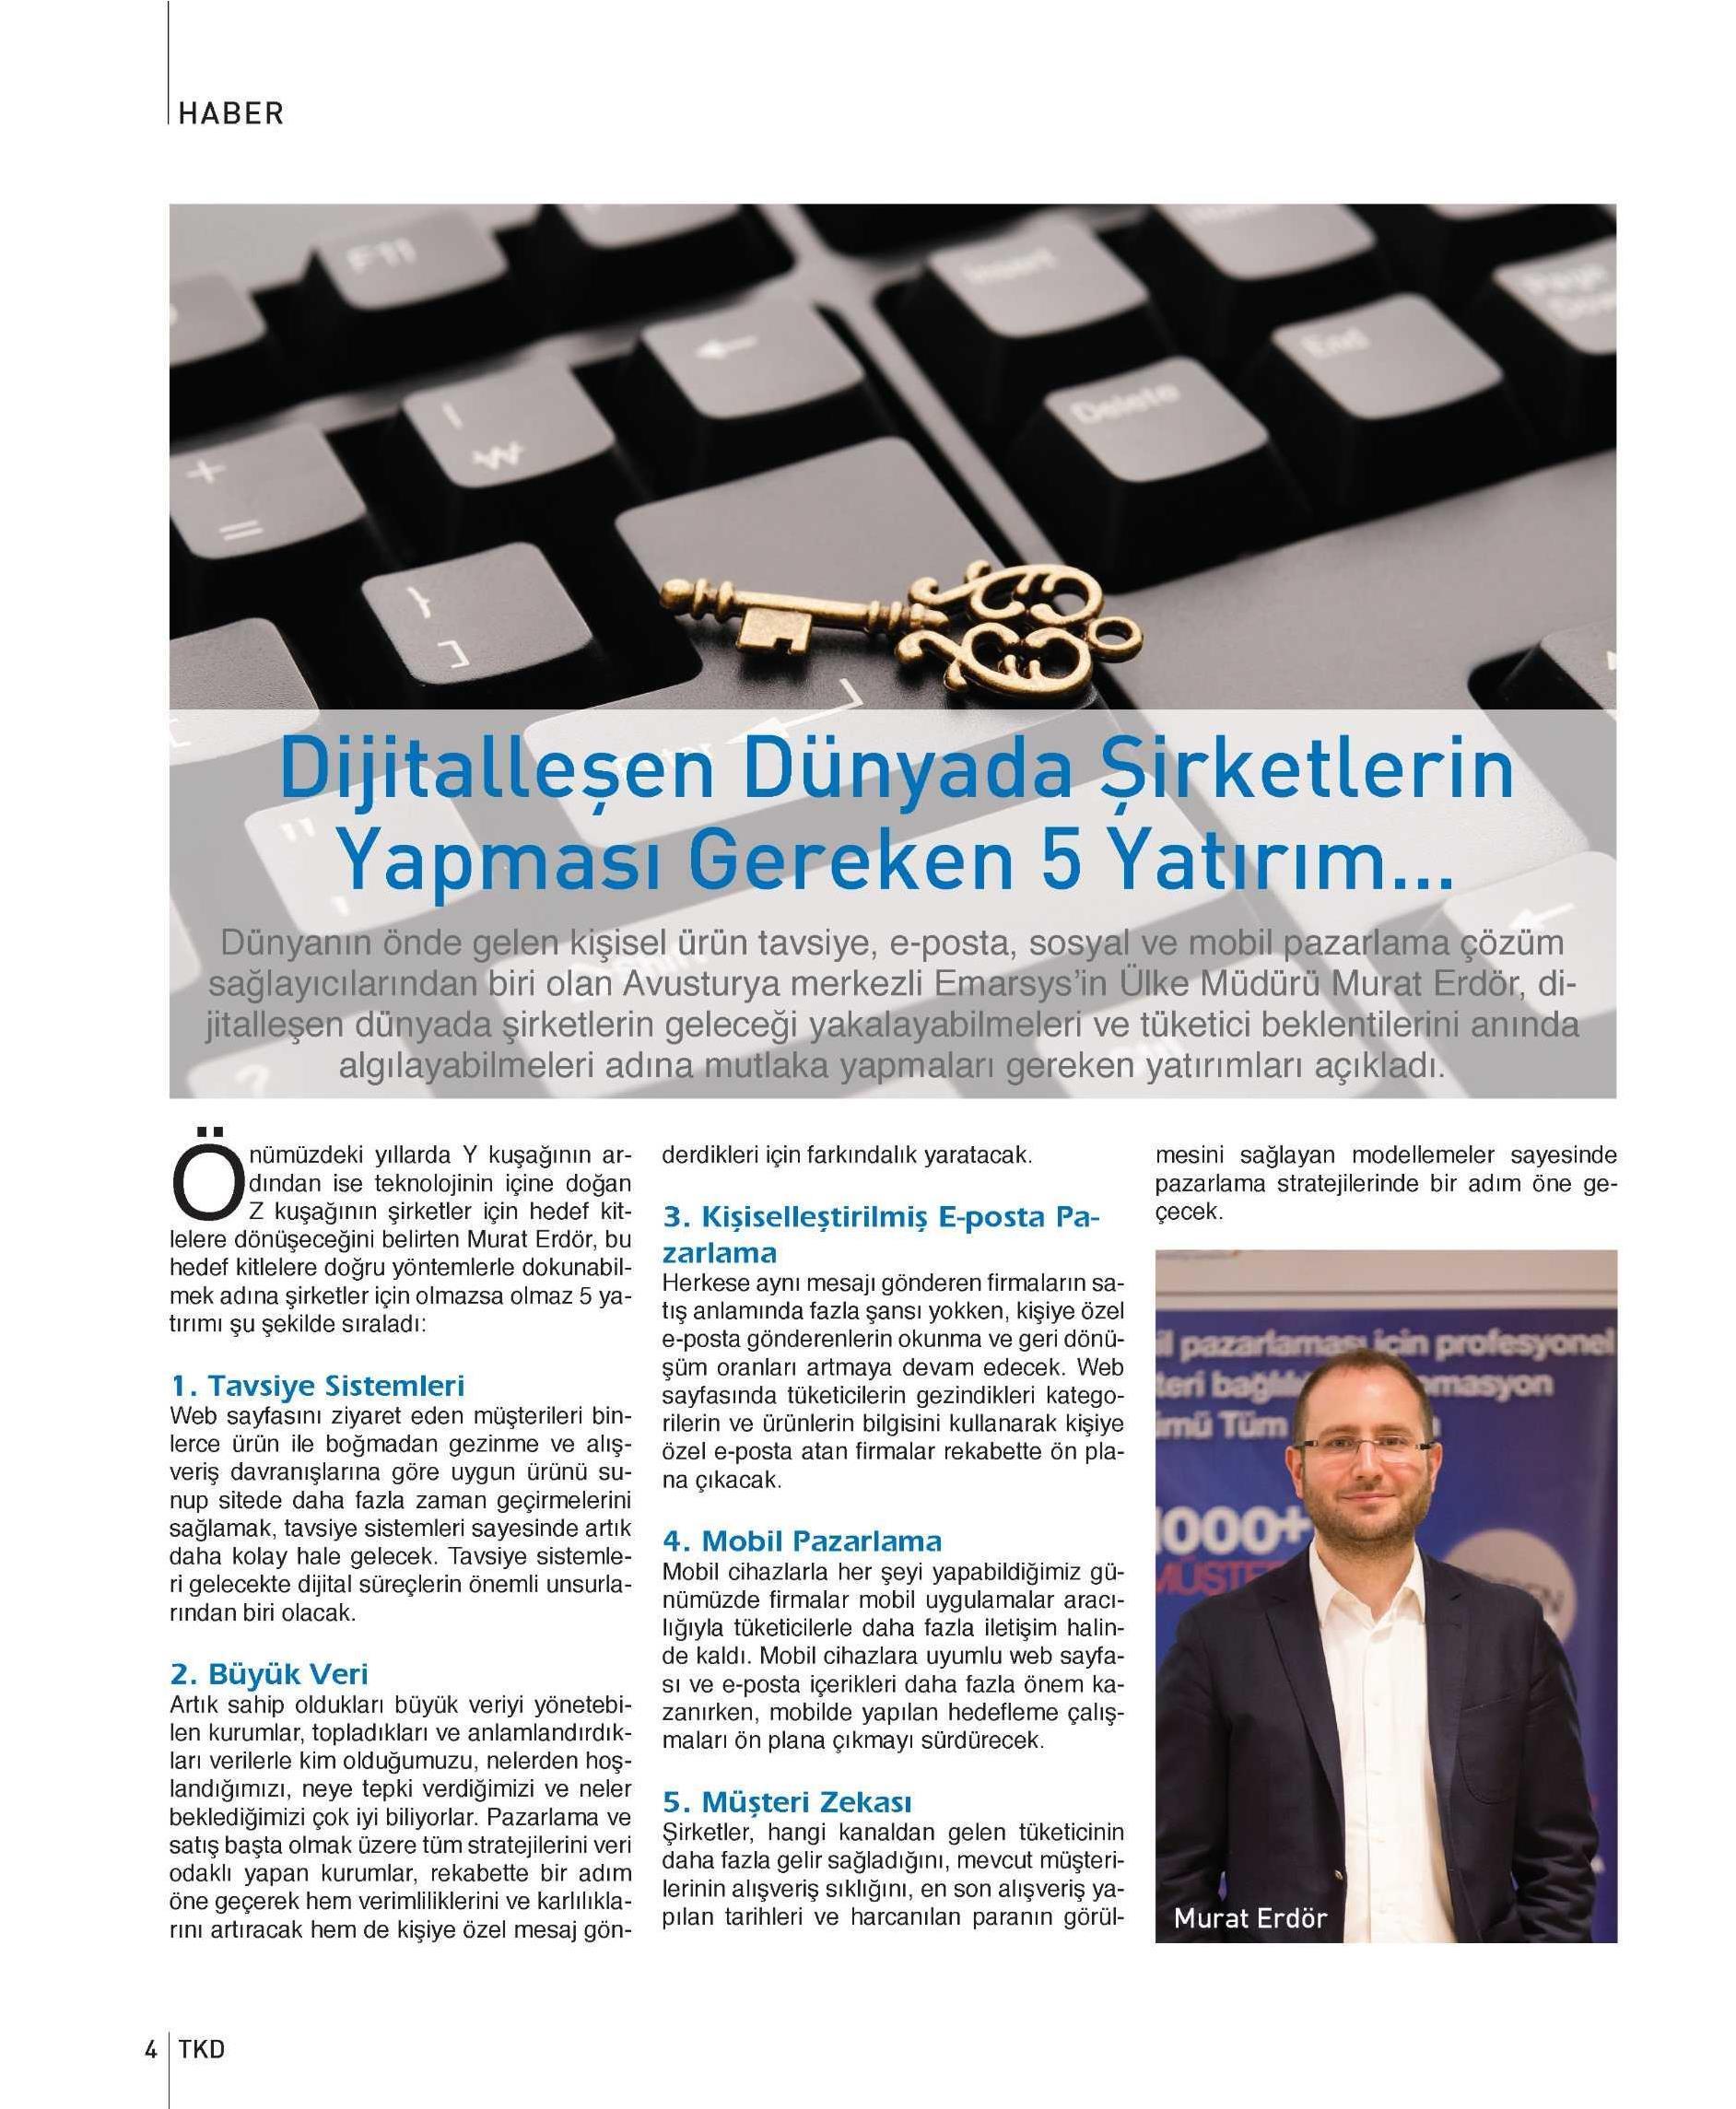 22 - Turizm ve Kongre Dergisi_ muraterdor.com_Eylül 2015